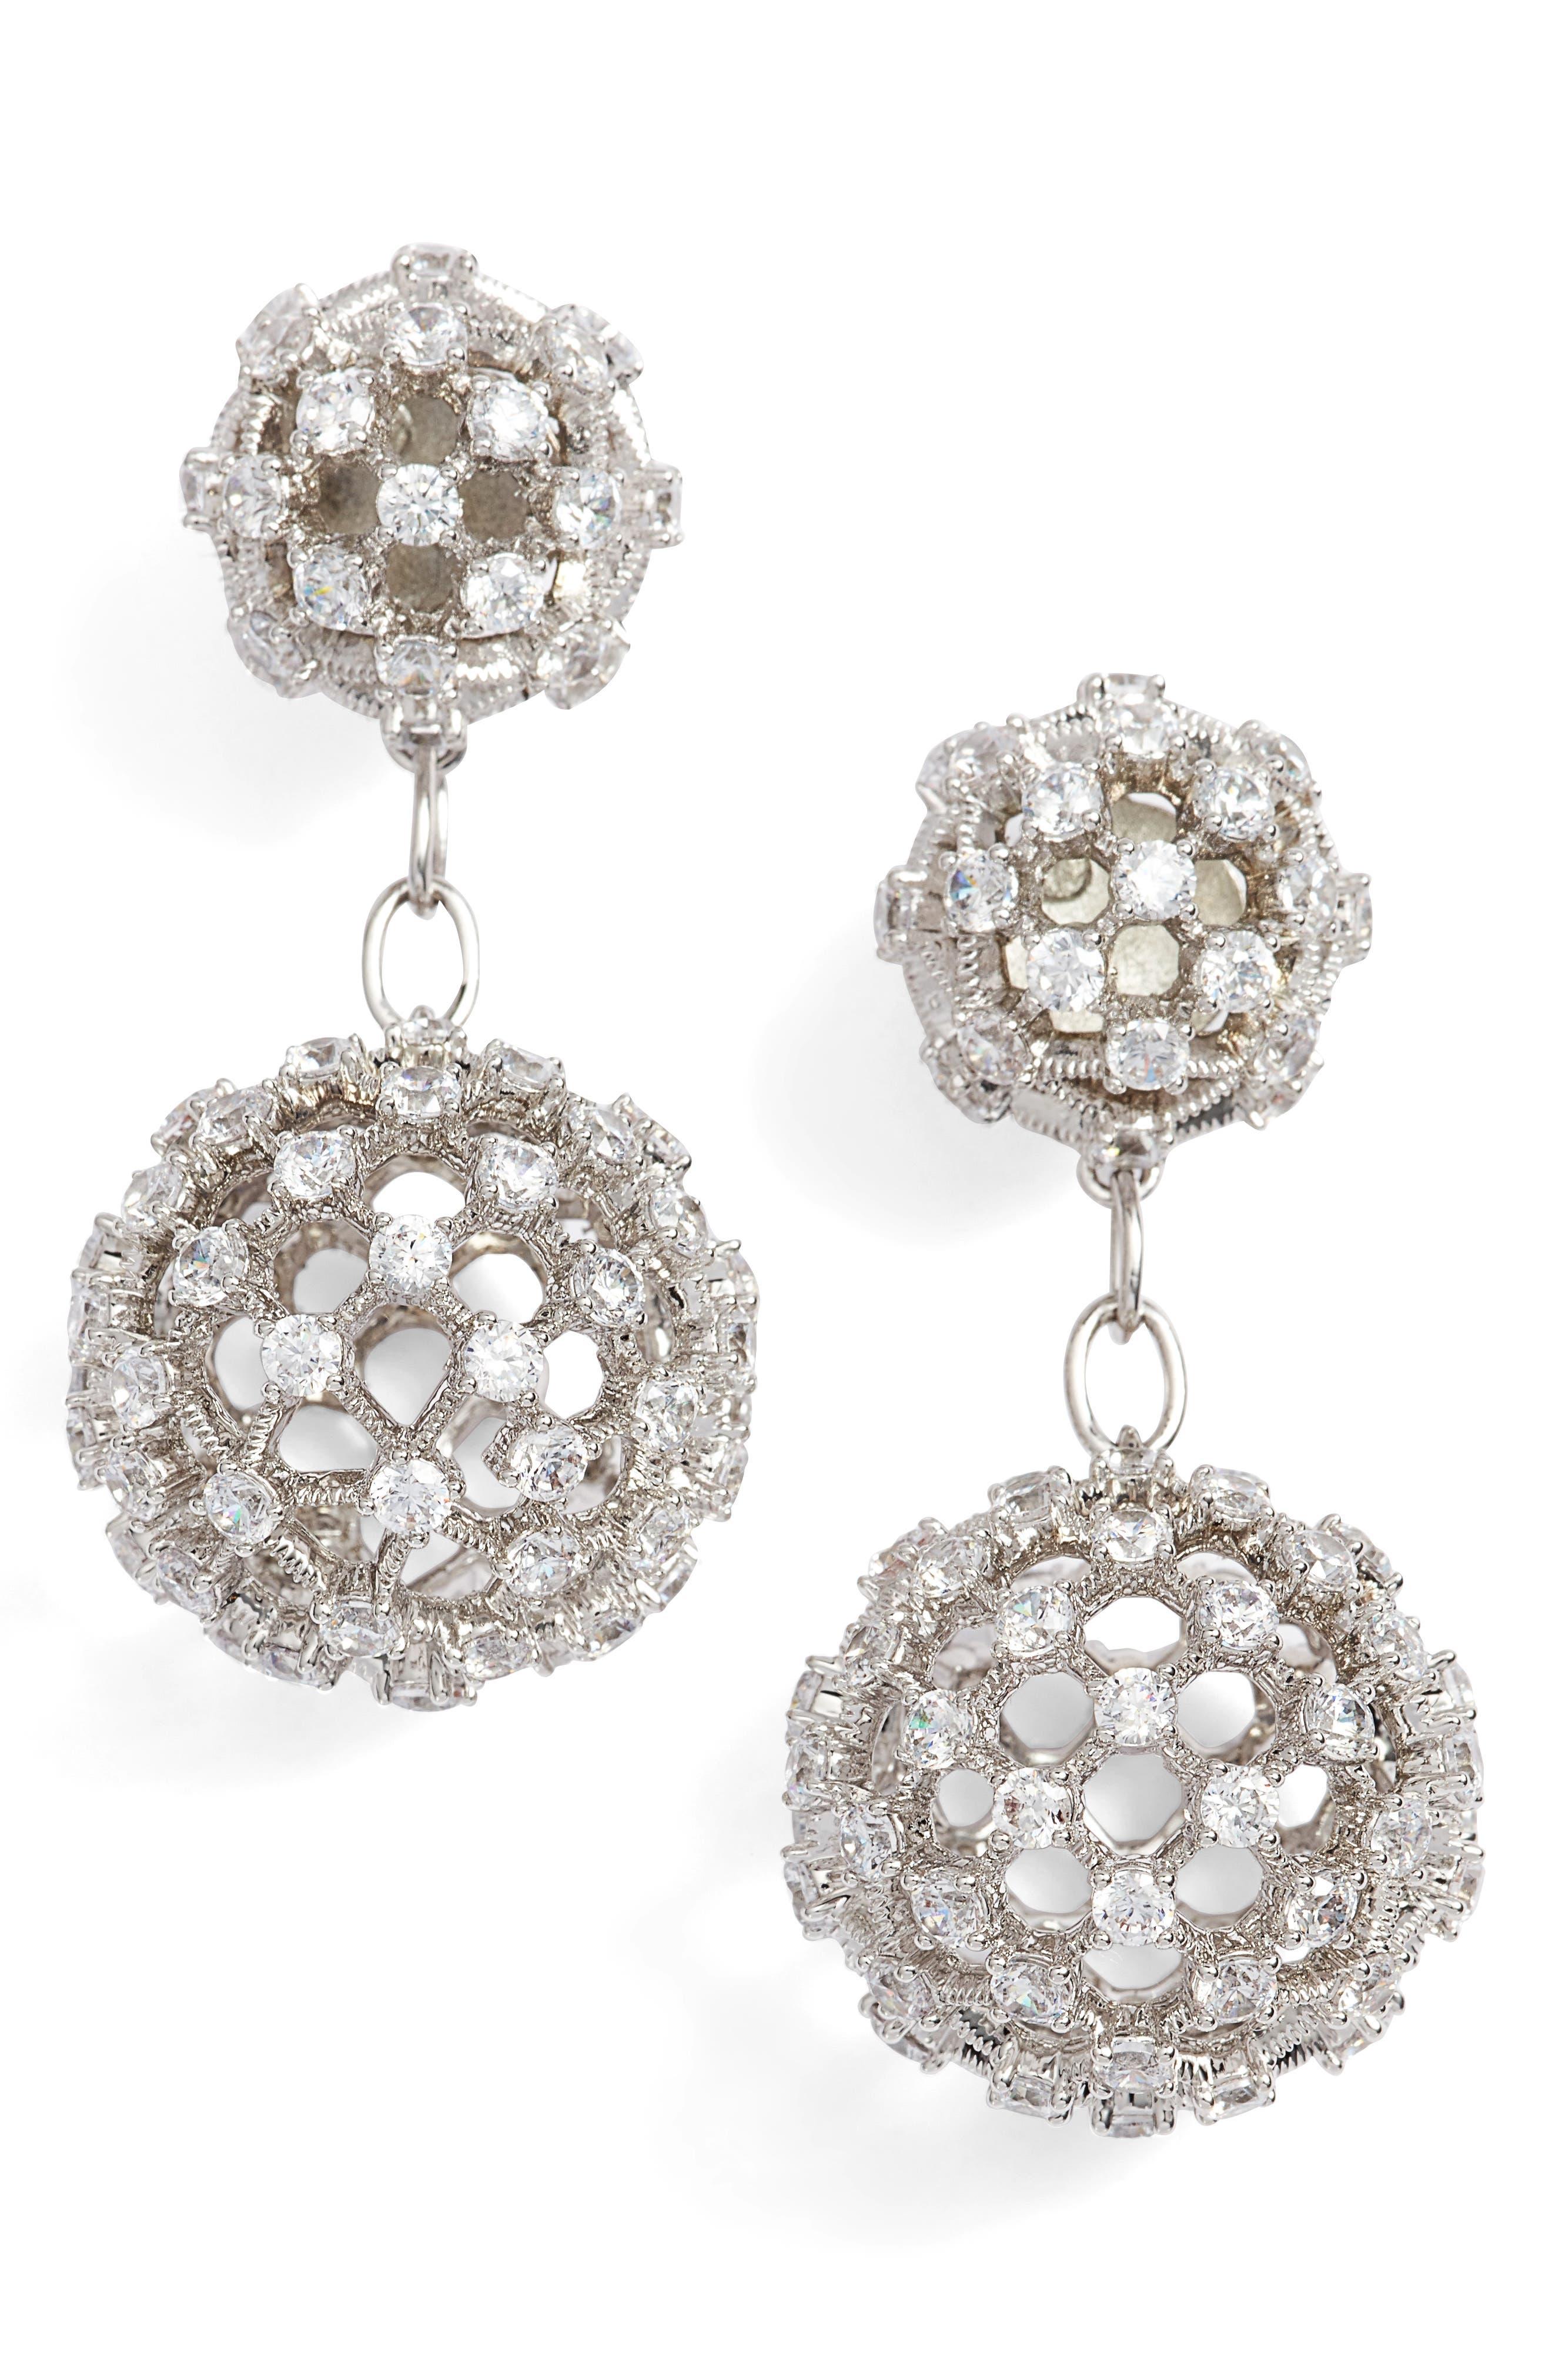 Cubic Zirconia Double Drop Earrings,                         Main,                         color, Rhodium